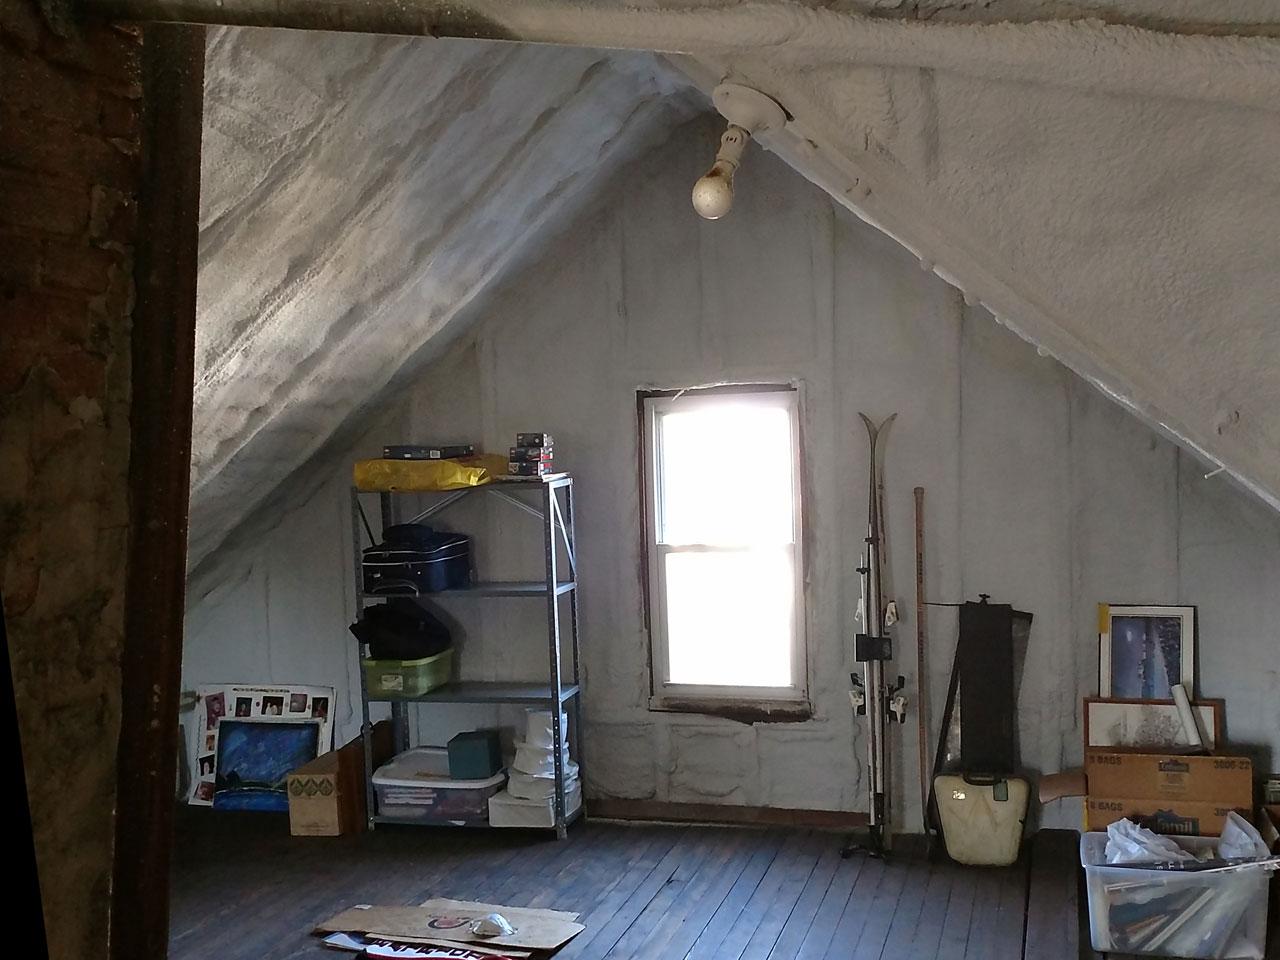 Spray foam contractor capital insulation Foam USA